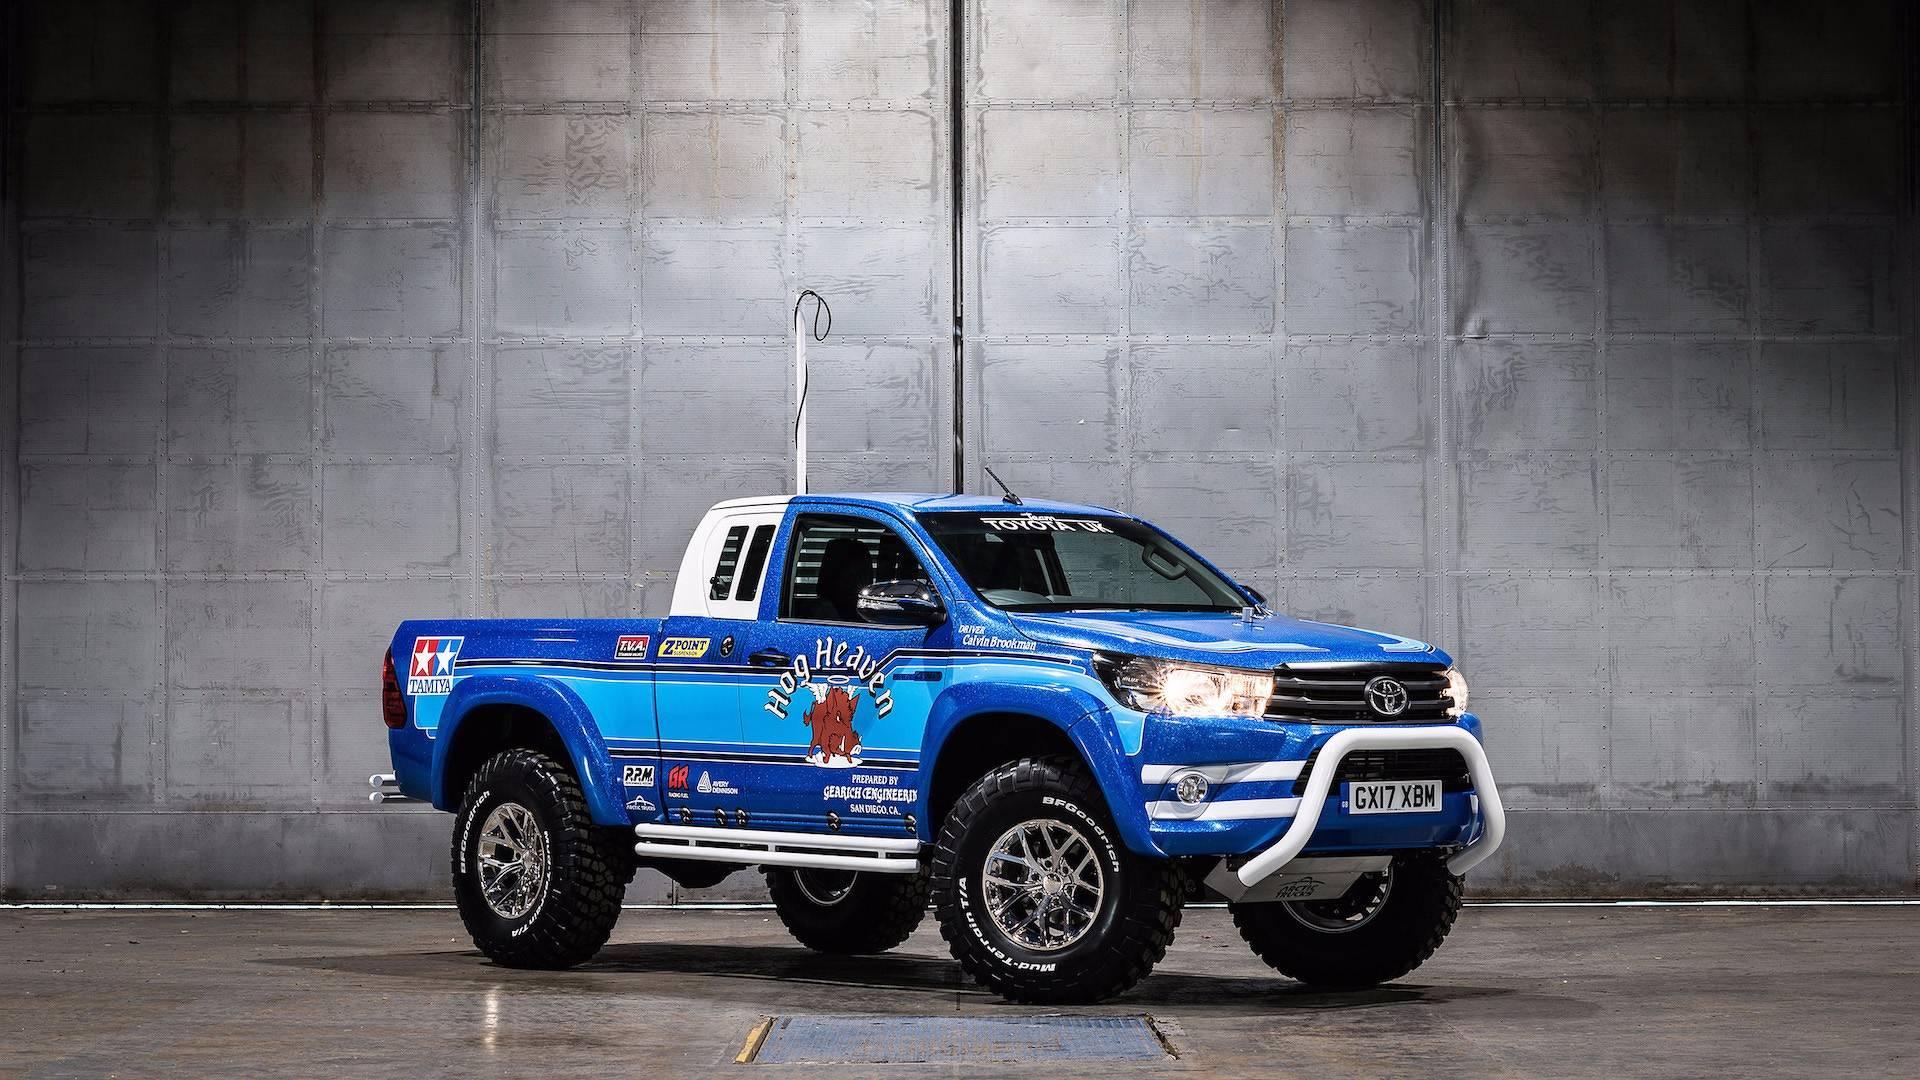 Toyota_Hilux_Bruiser_26